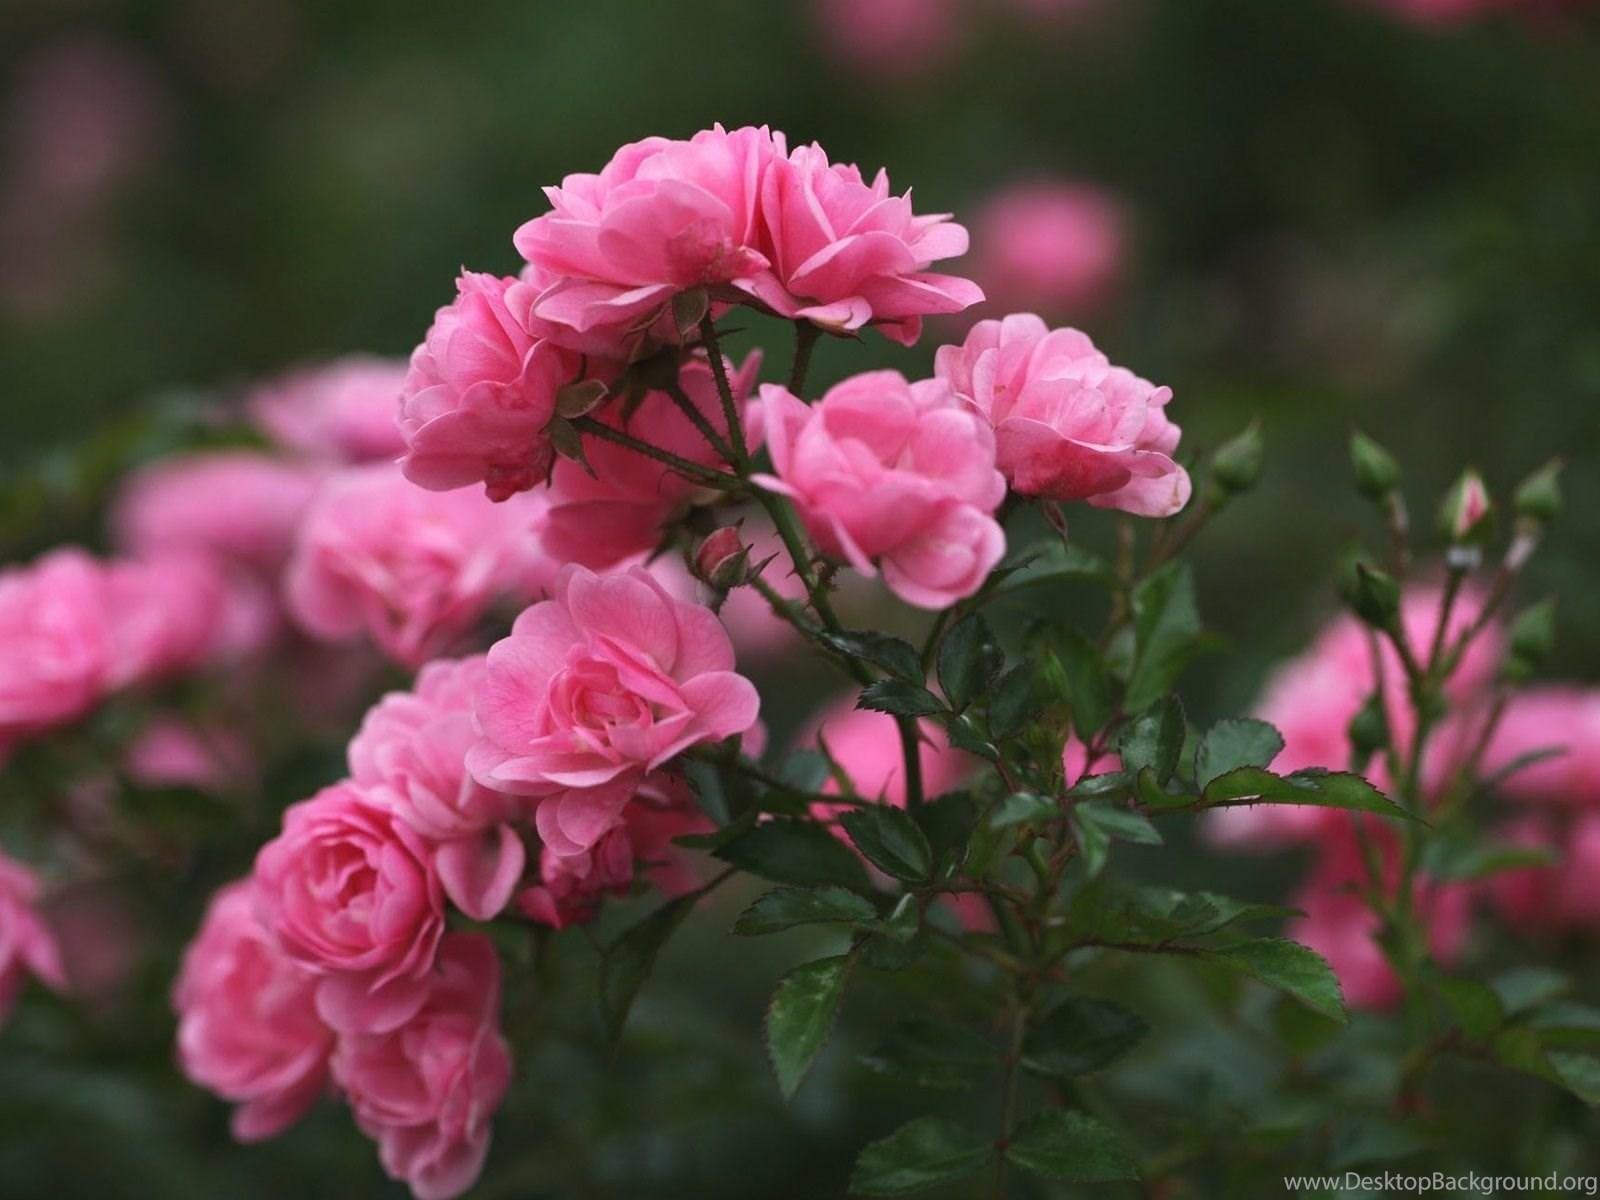 Roses pink flowers wallpapers free download of pink roses desktop fullscreen mightylinksfo